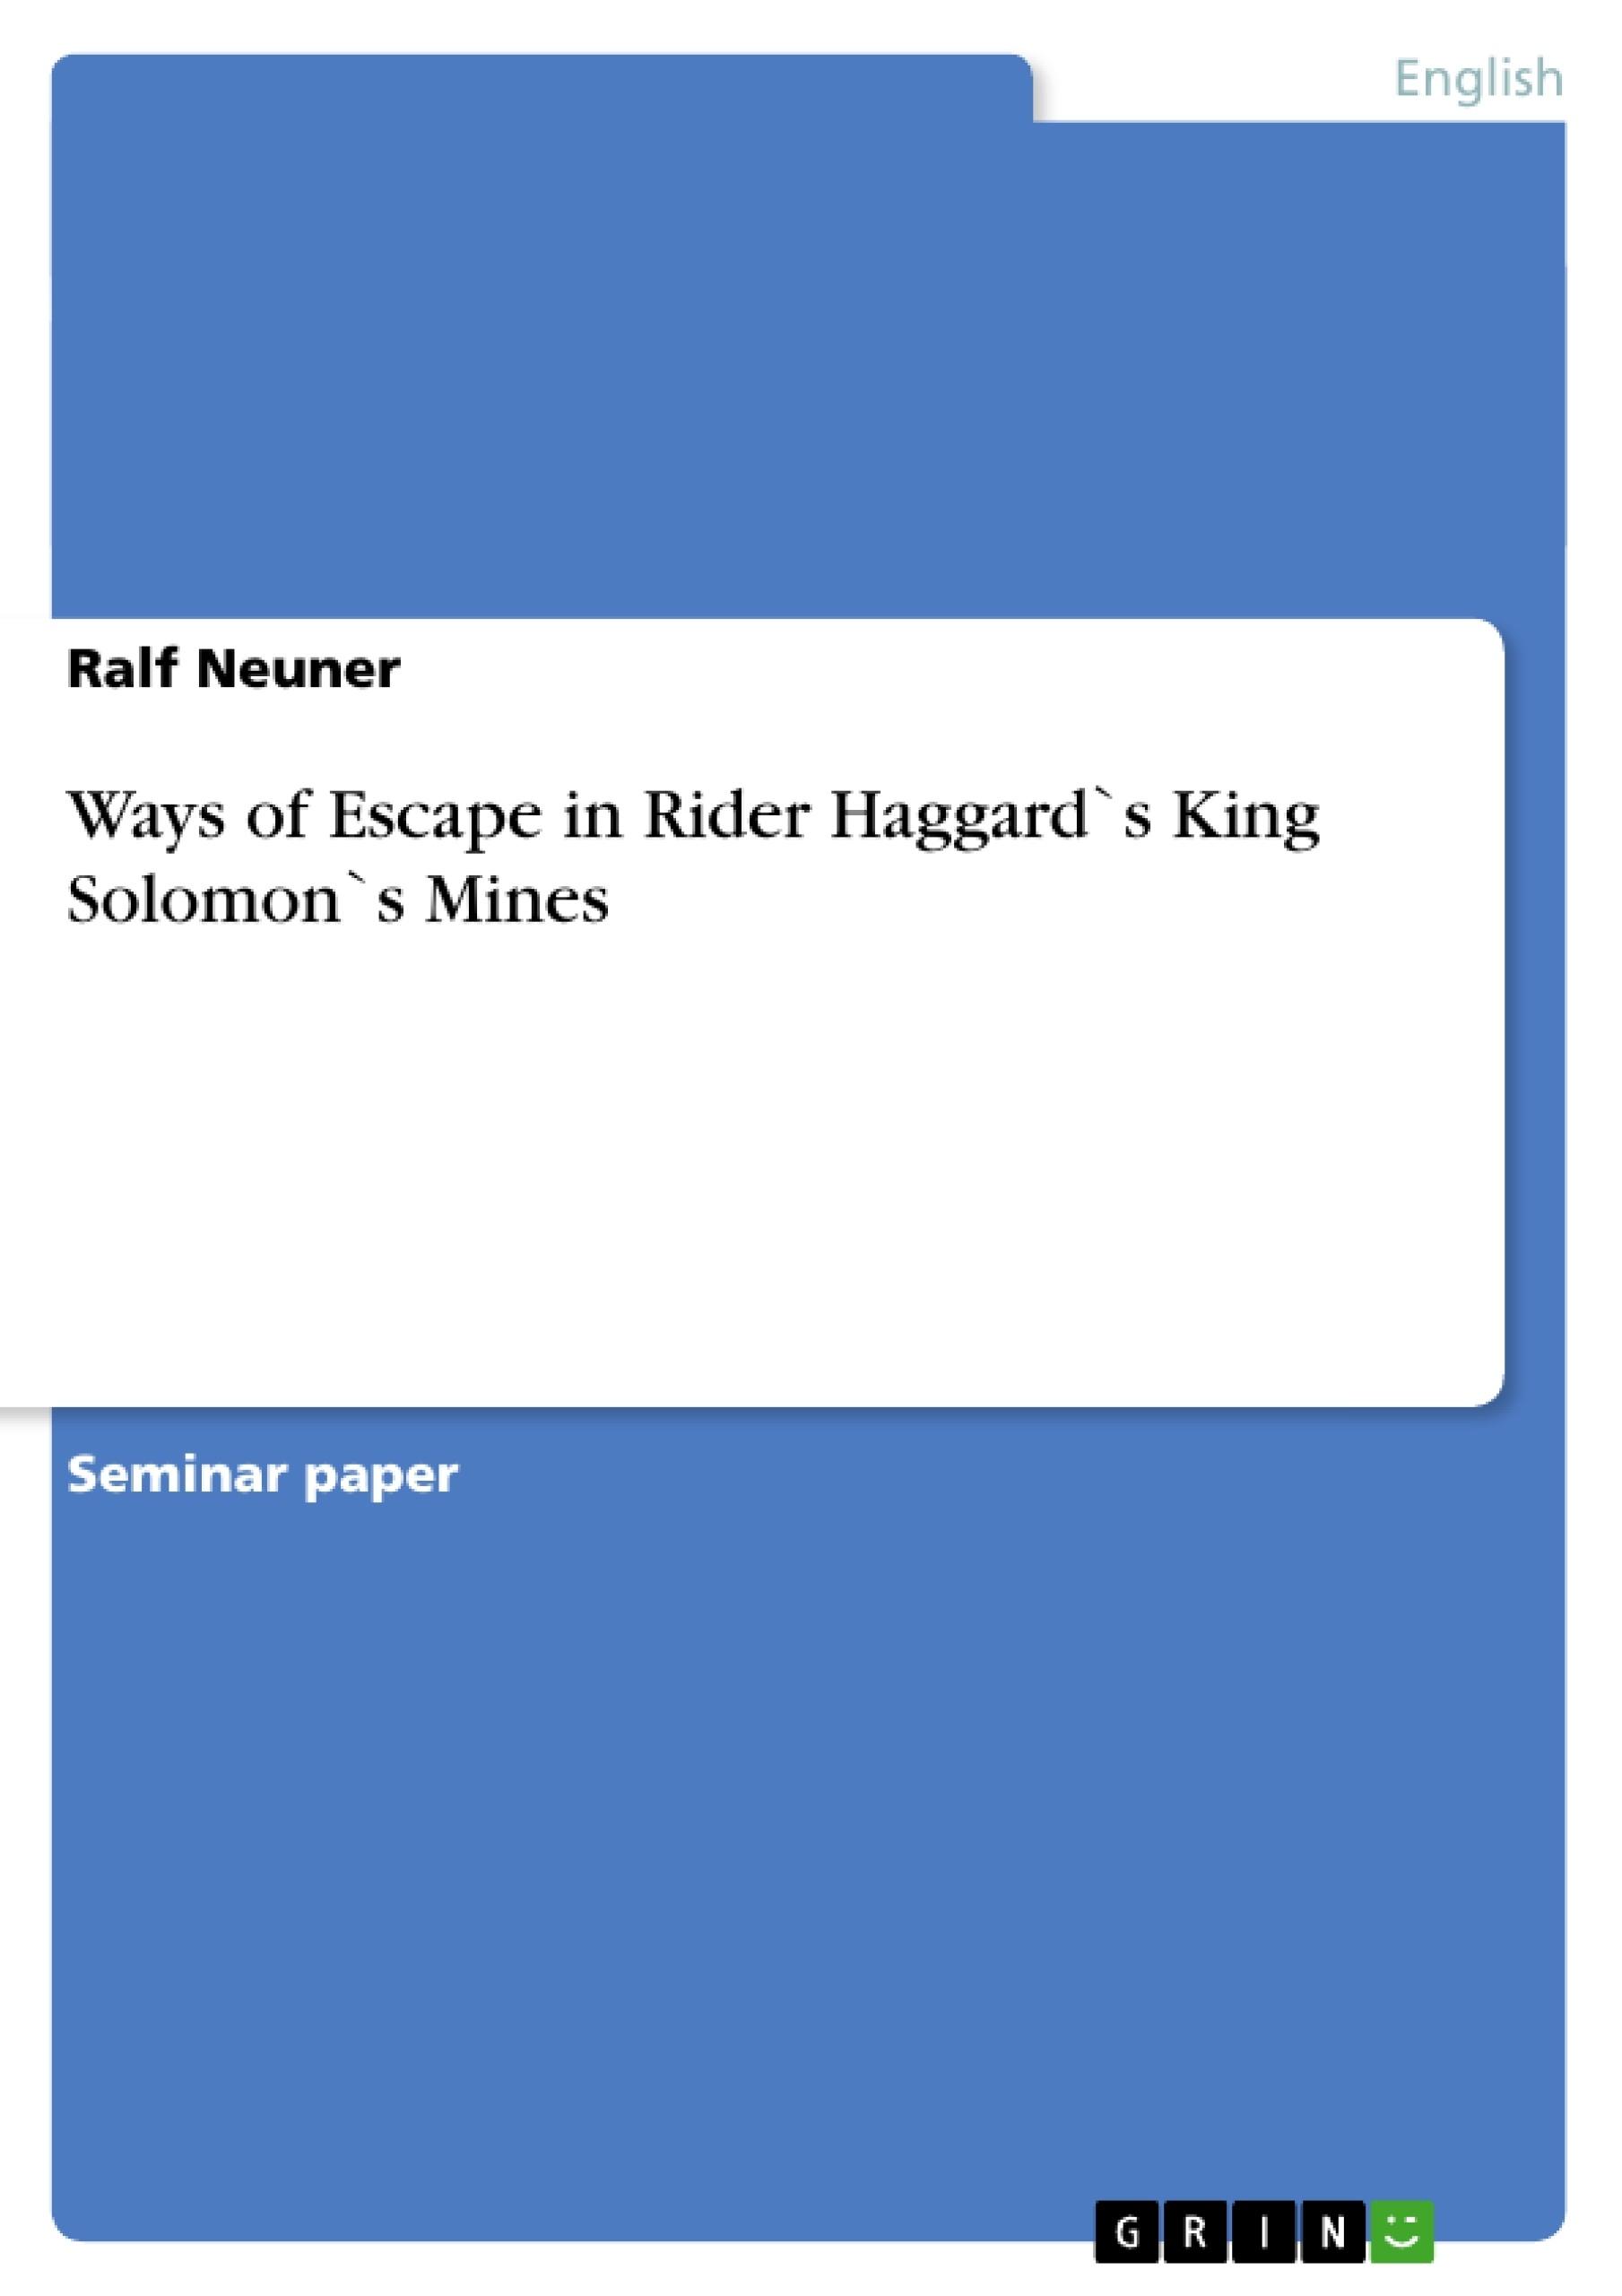 Title: Ways of Escape in Rider Haggard`s King Solomon`s Mines